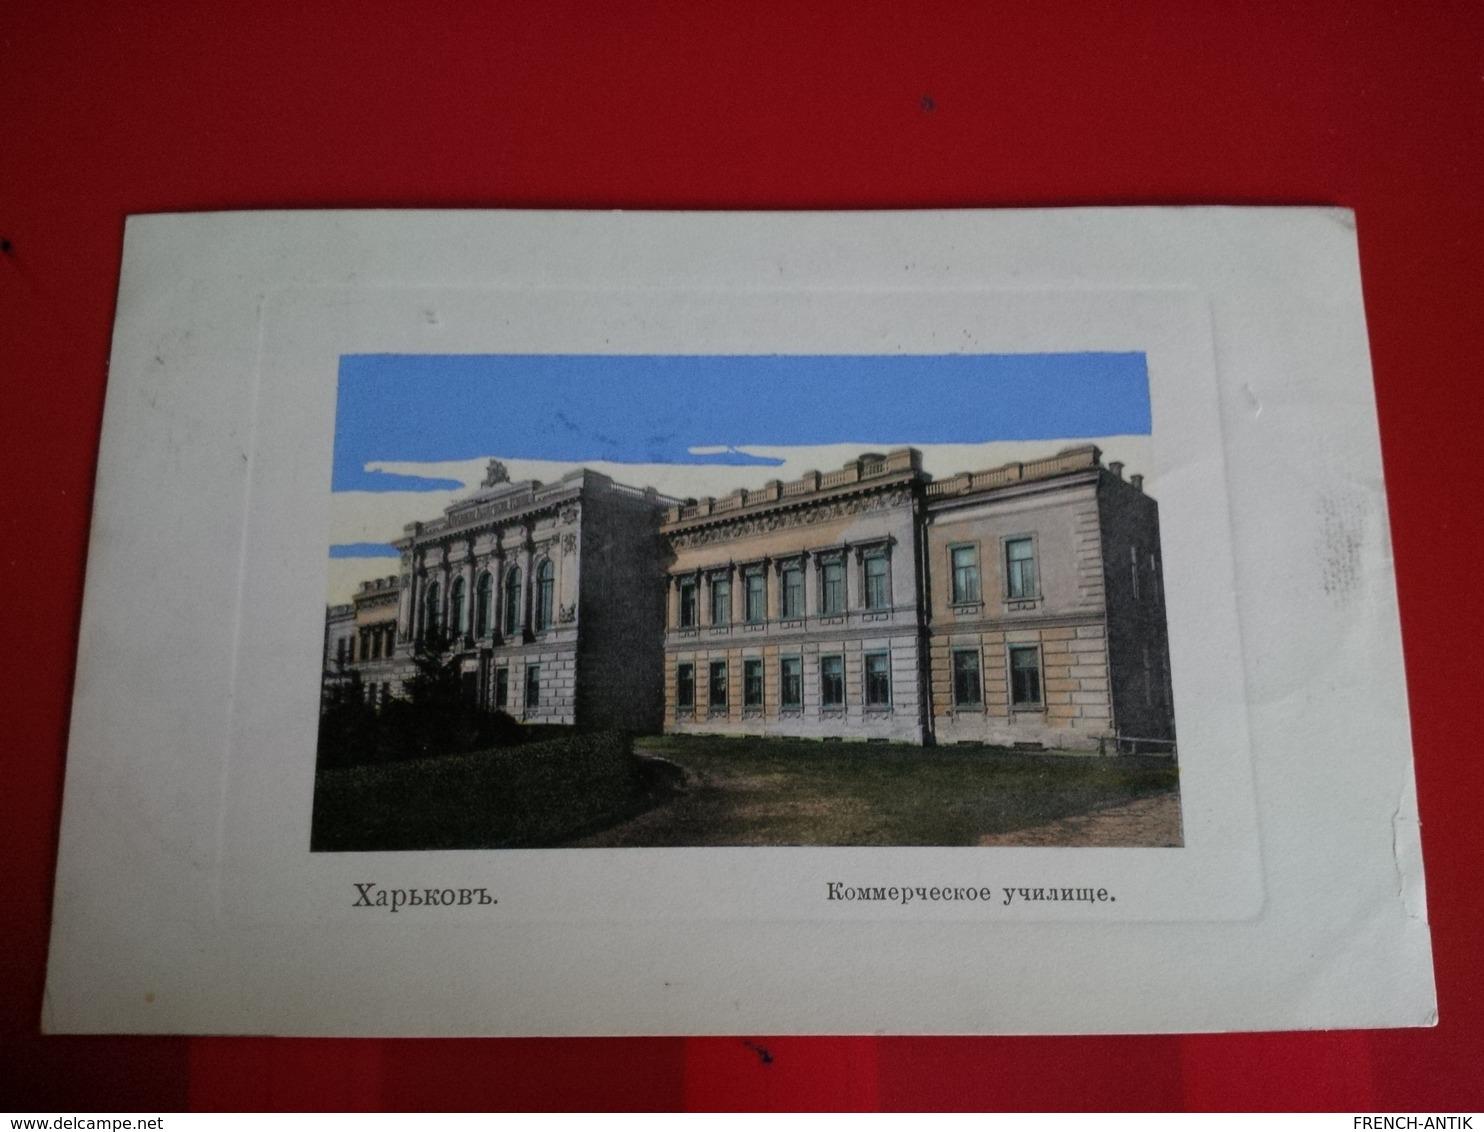 KHARKOV - Ukraine